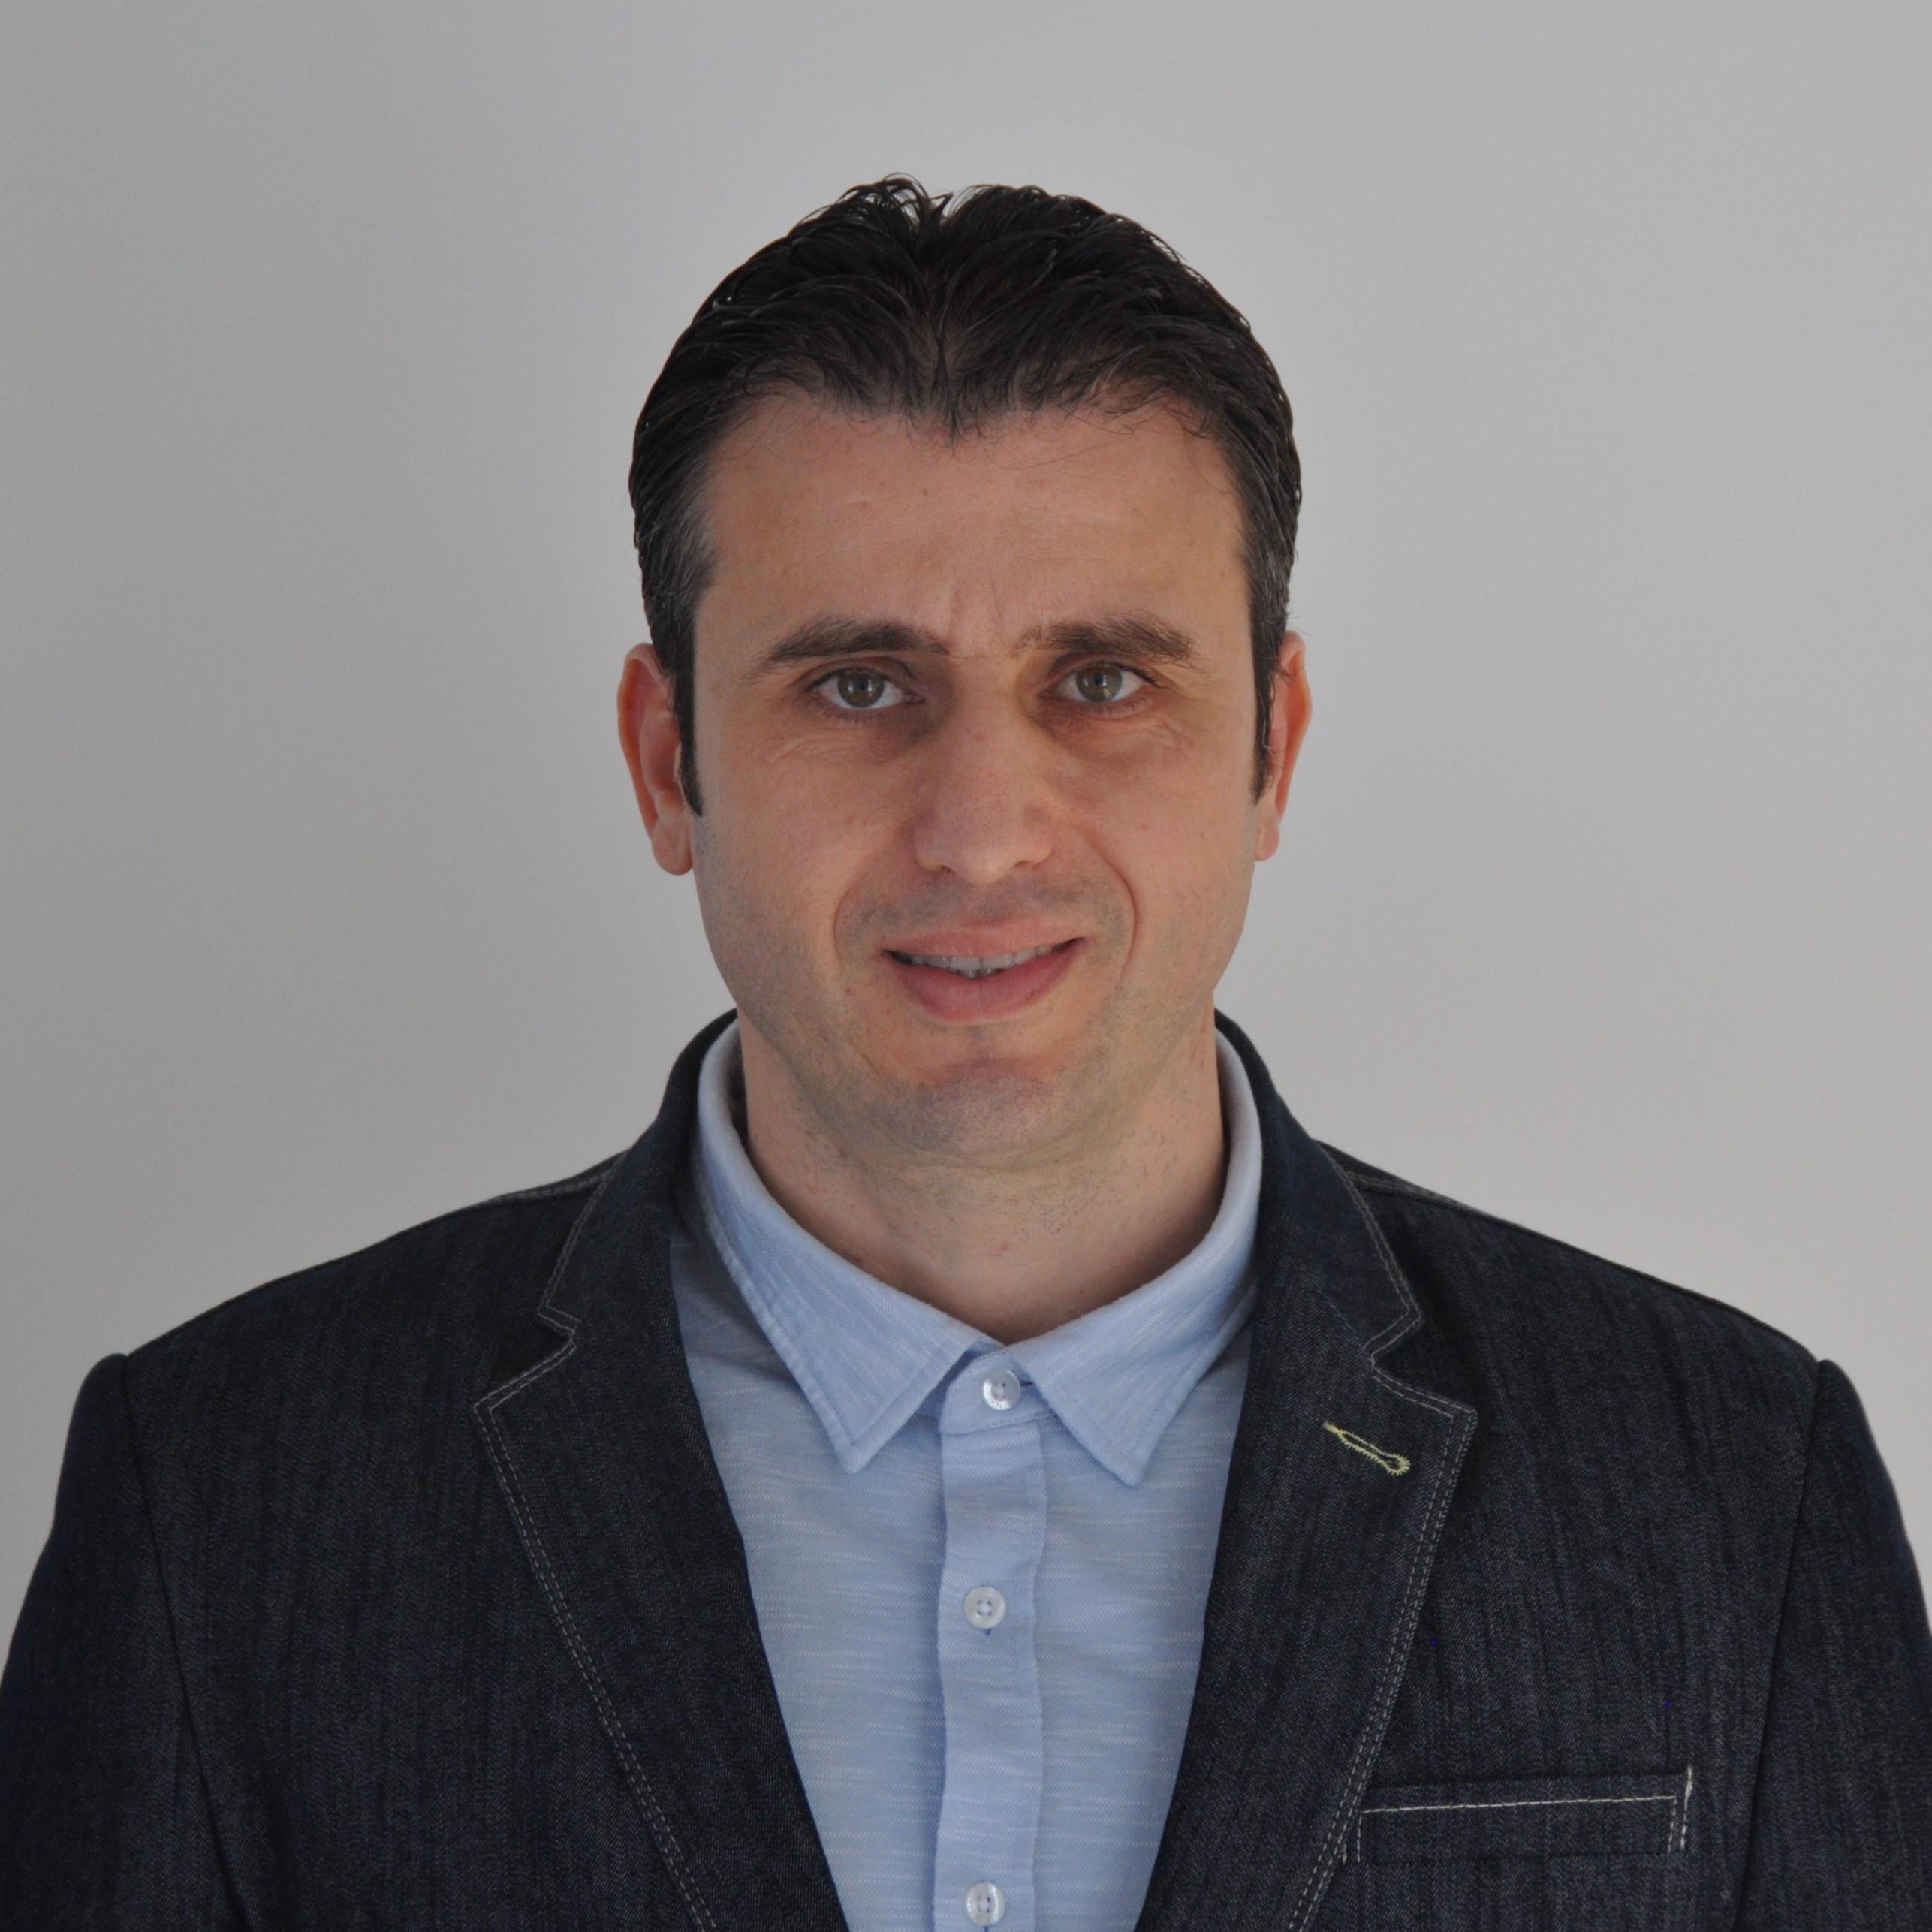 Иван Запрянов